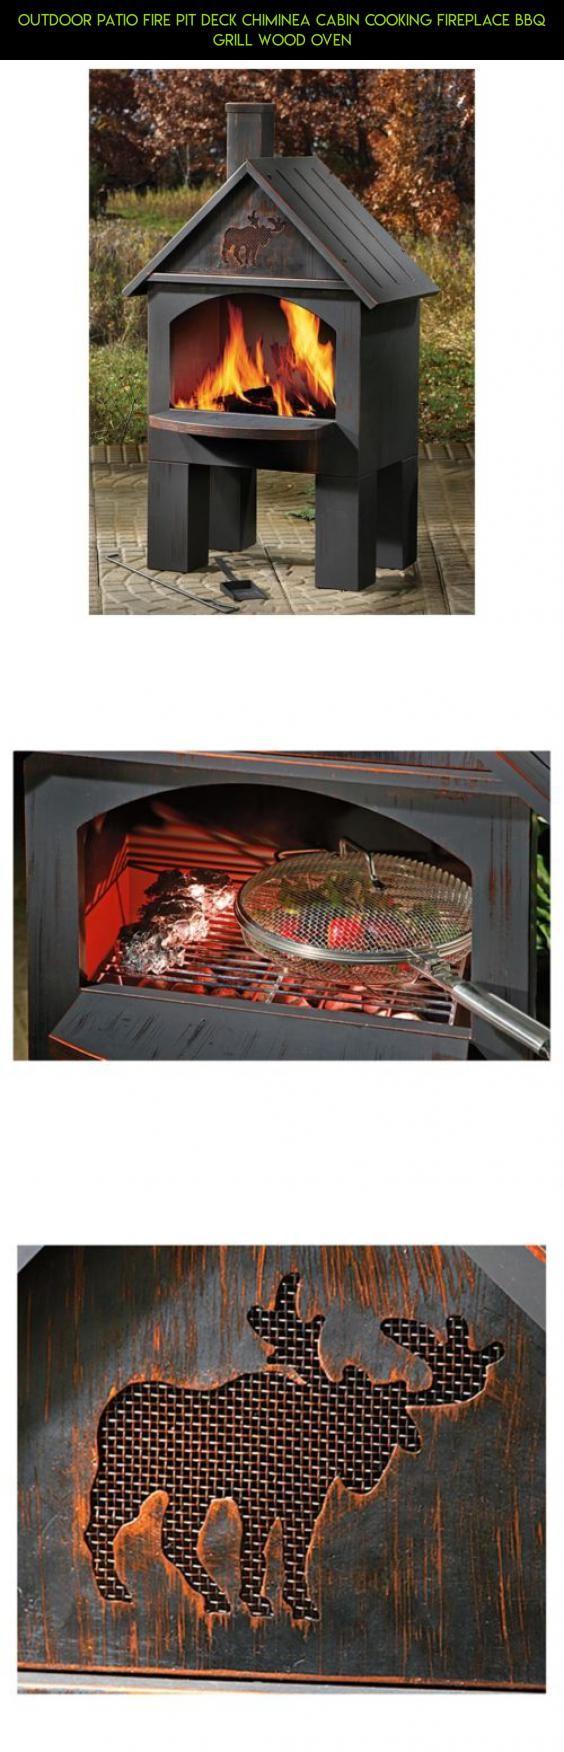 más de 25 ideas increíbles sobre deck oven en pinterest terrace